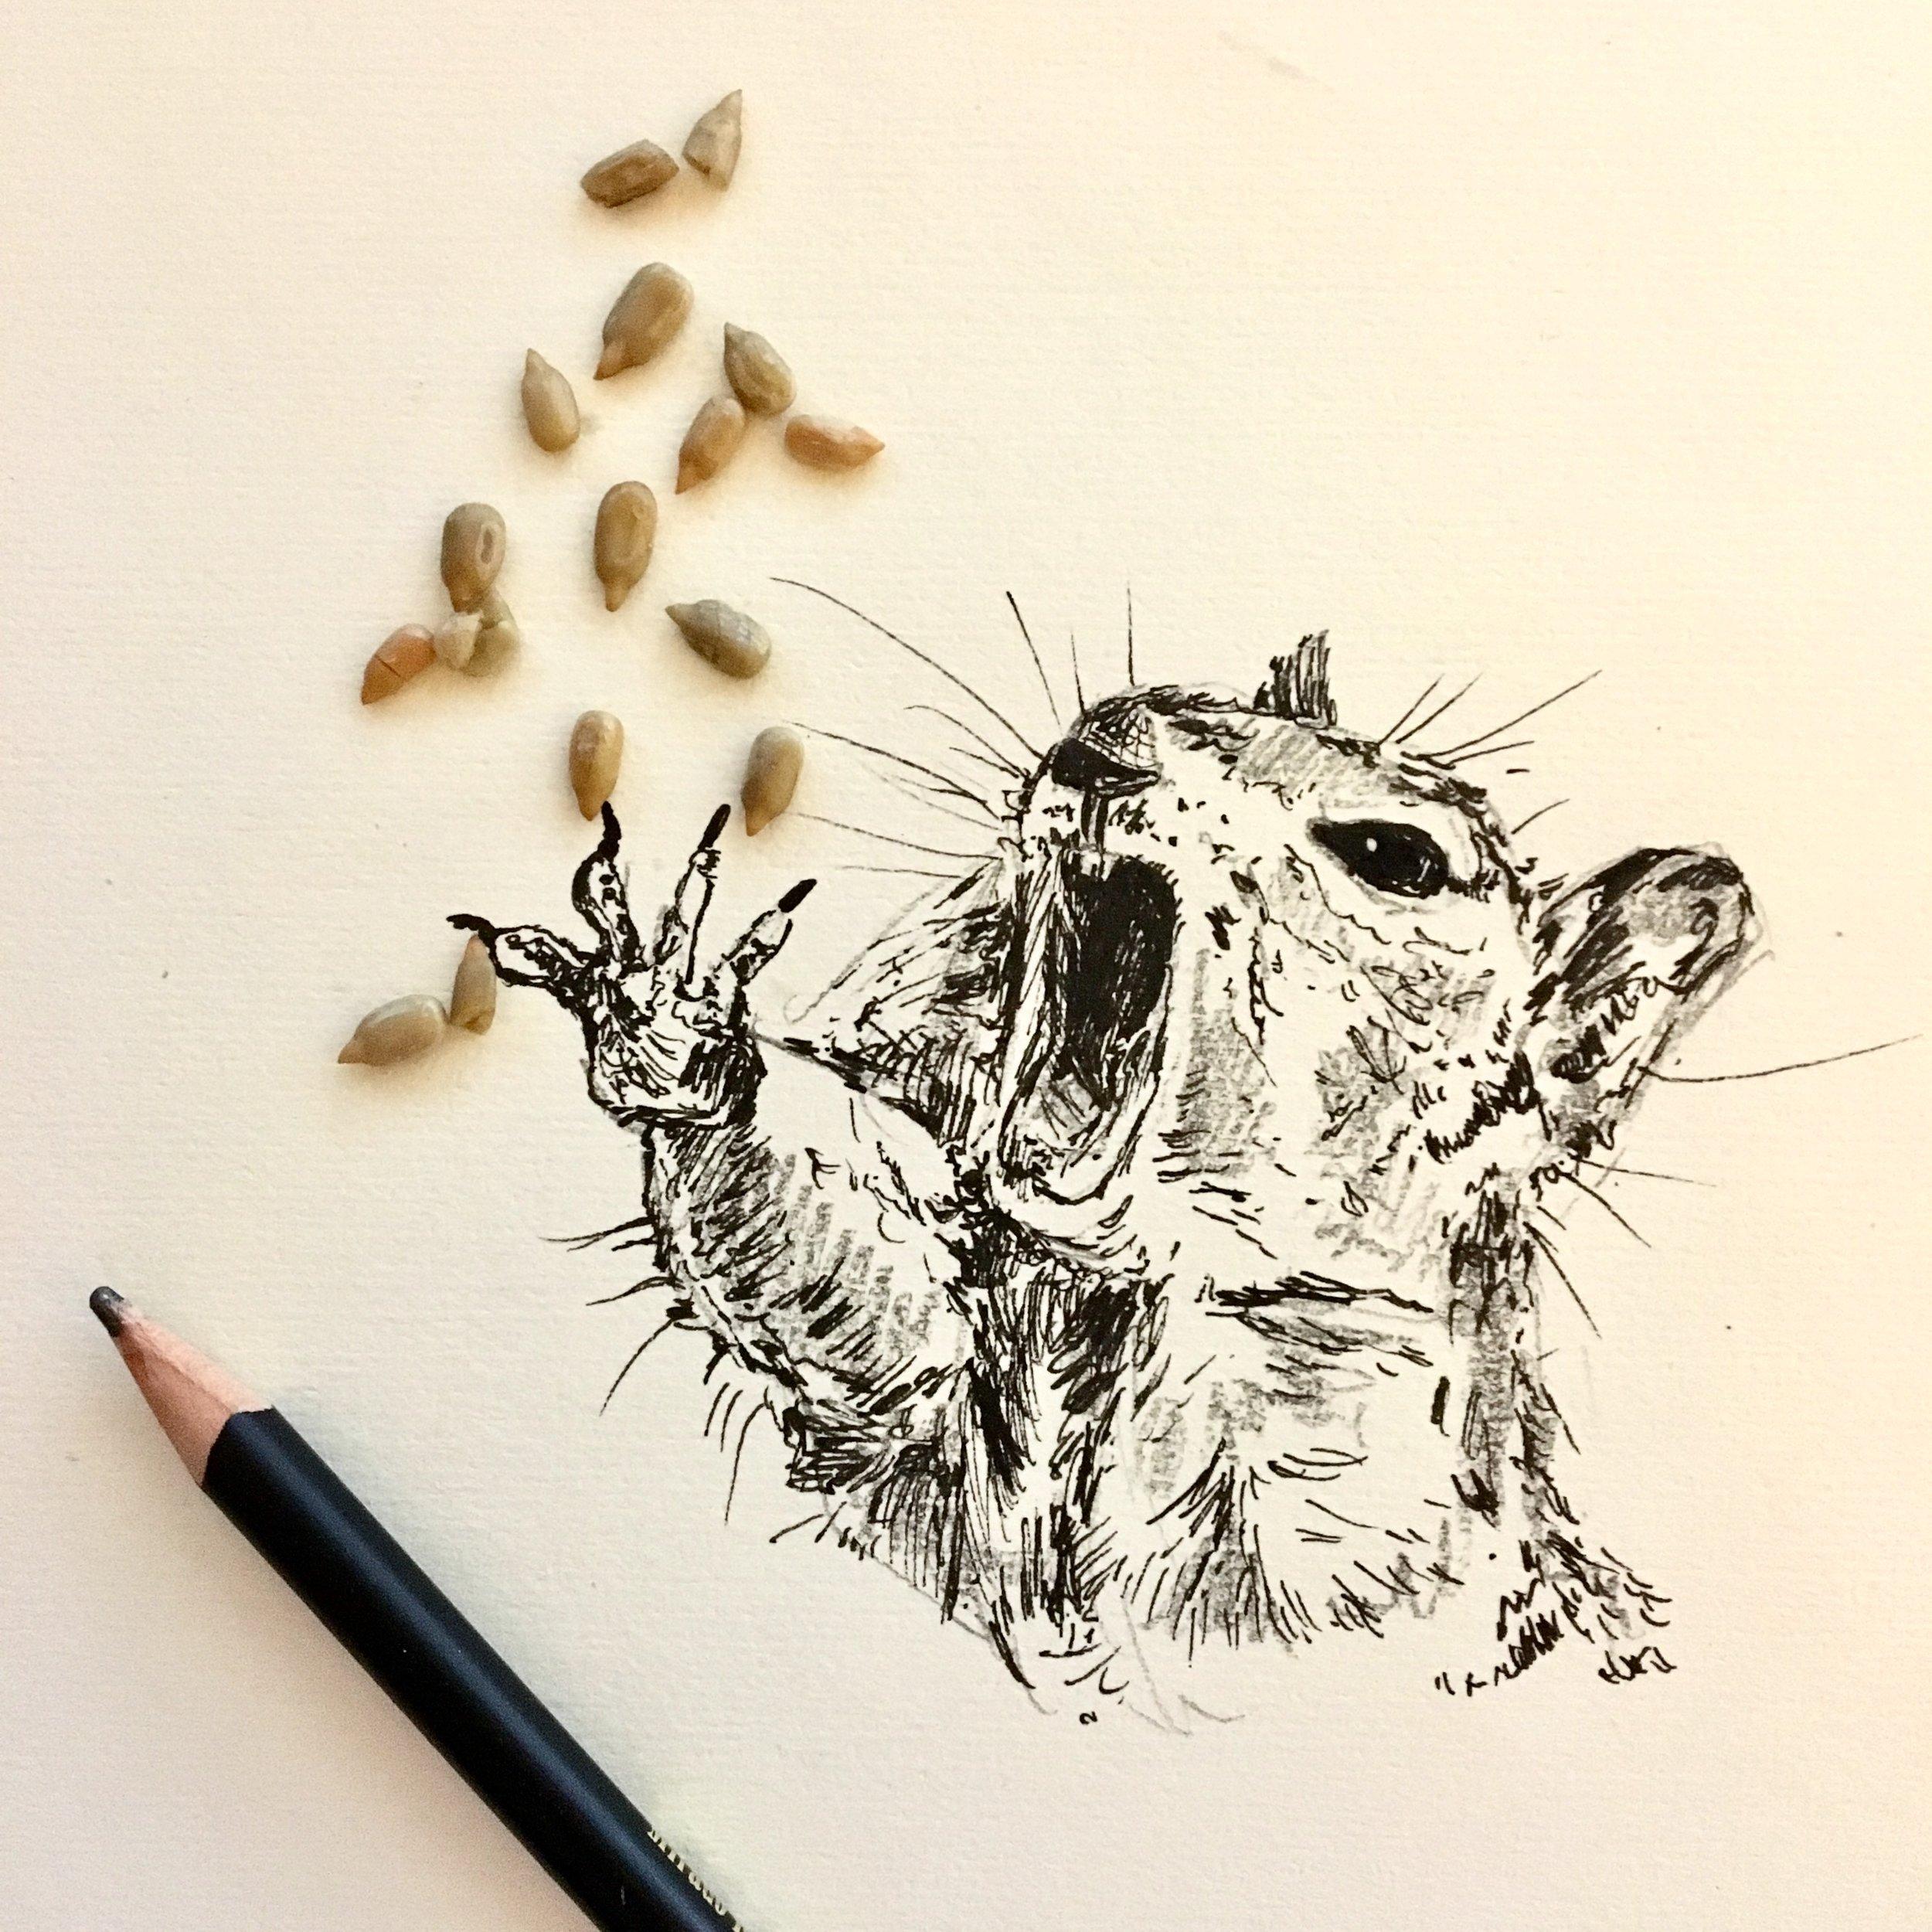 squirrel-interactive-illustration-by-jordan-fretz-art.jpg